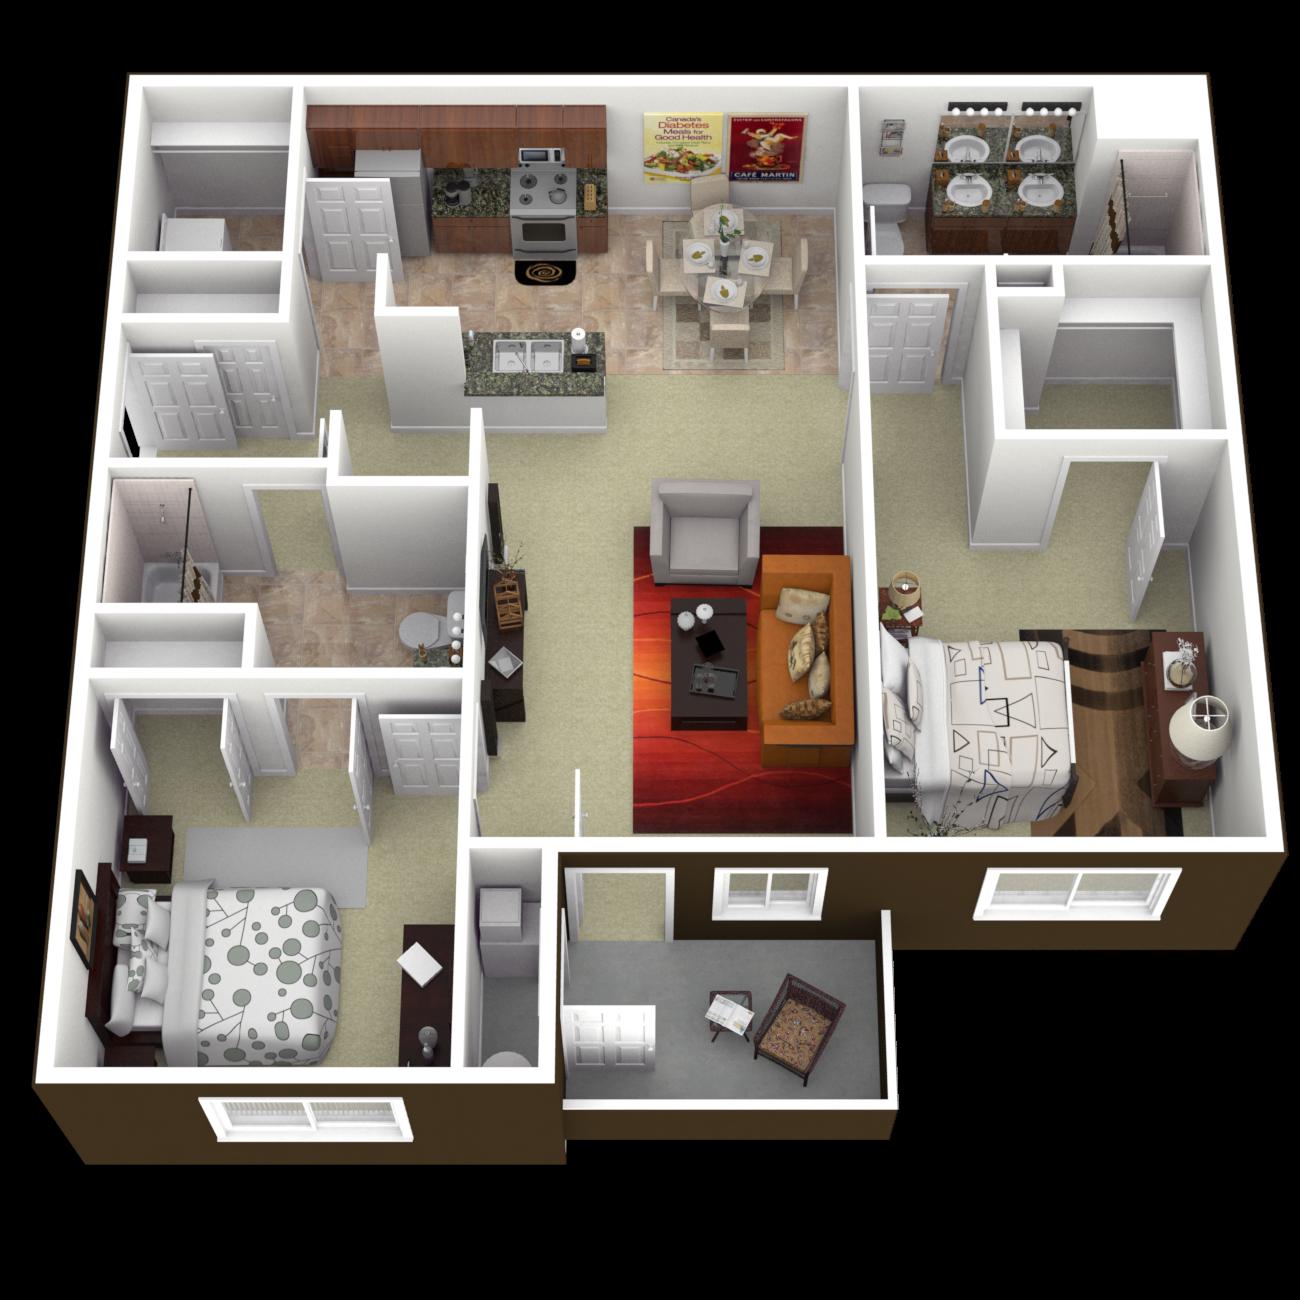 The Malibu Floor Plan 2